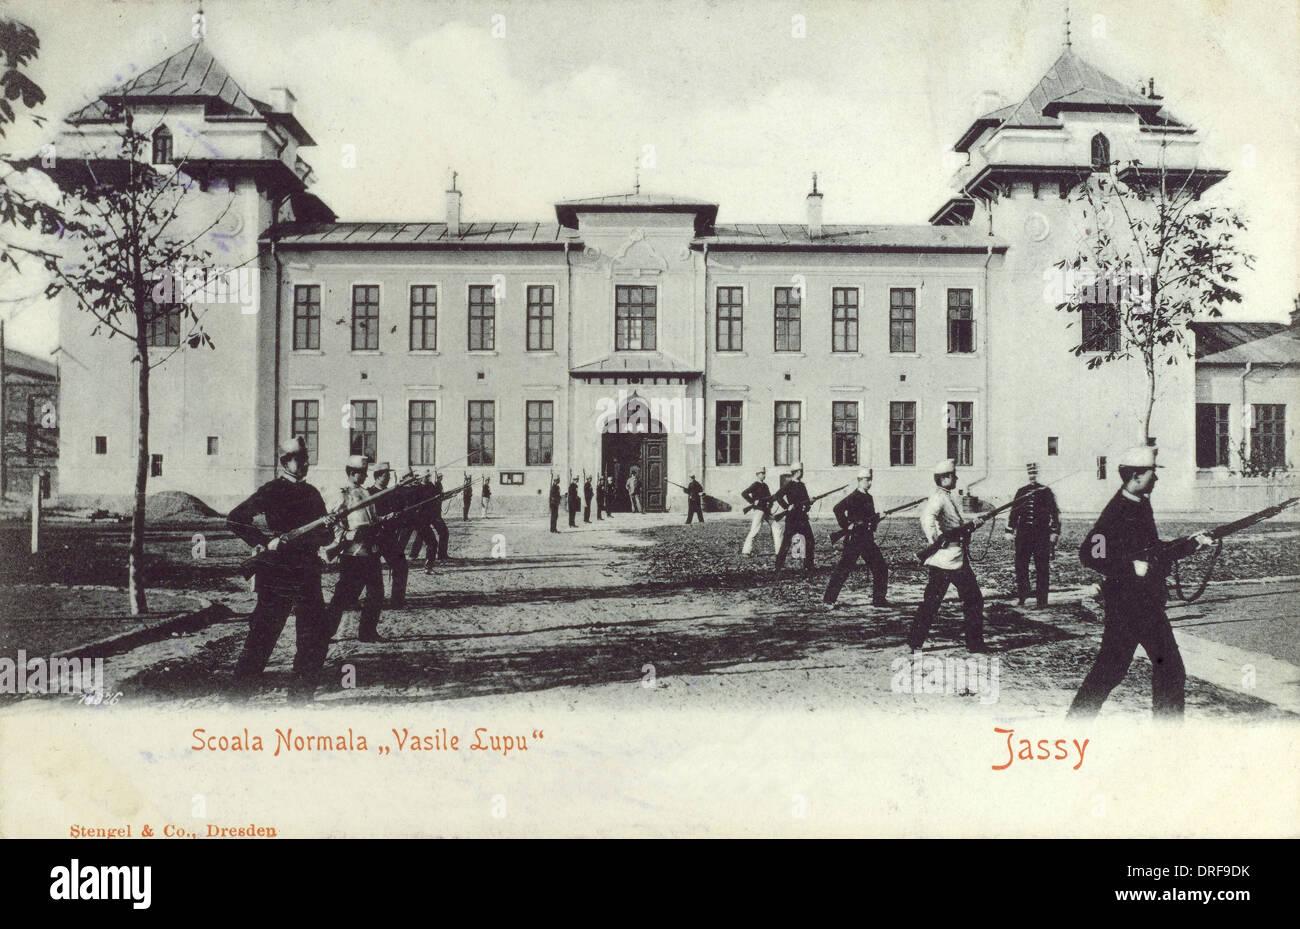 Romania - Iasi - Vasile Lupu Normal School - Stock Image